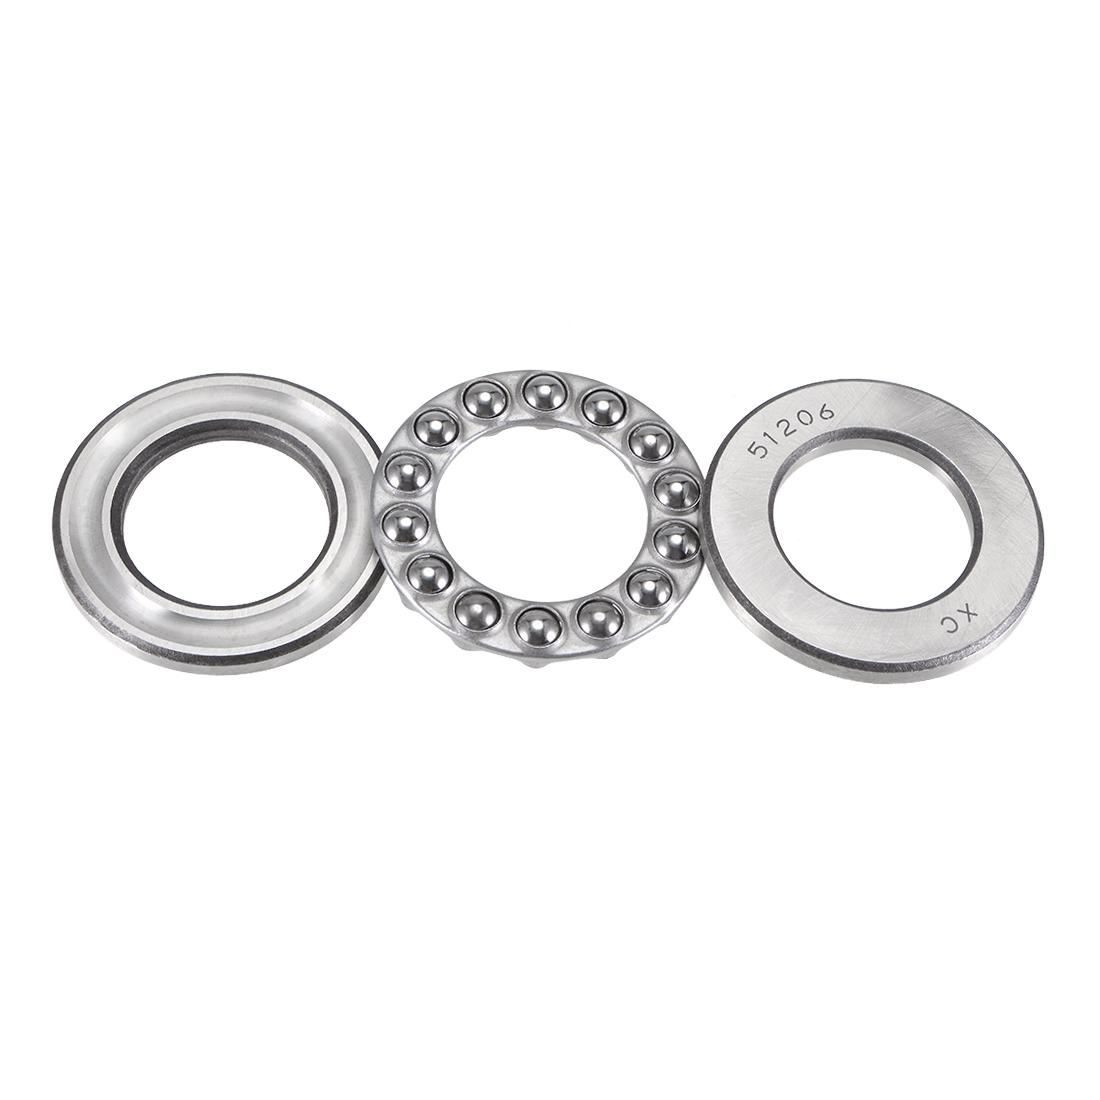 Carbon Steel Ball Thrust Bearing 51206 30mm x 52mm x 16mm